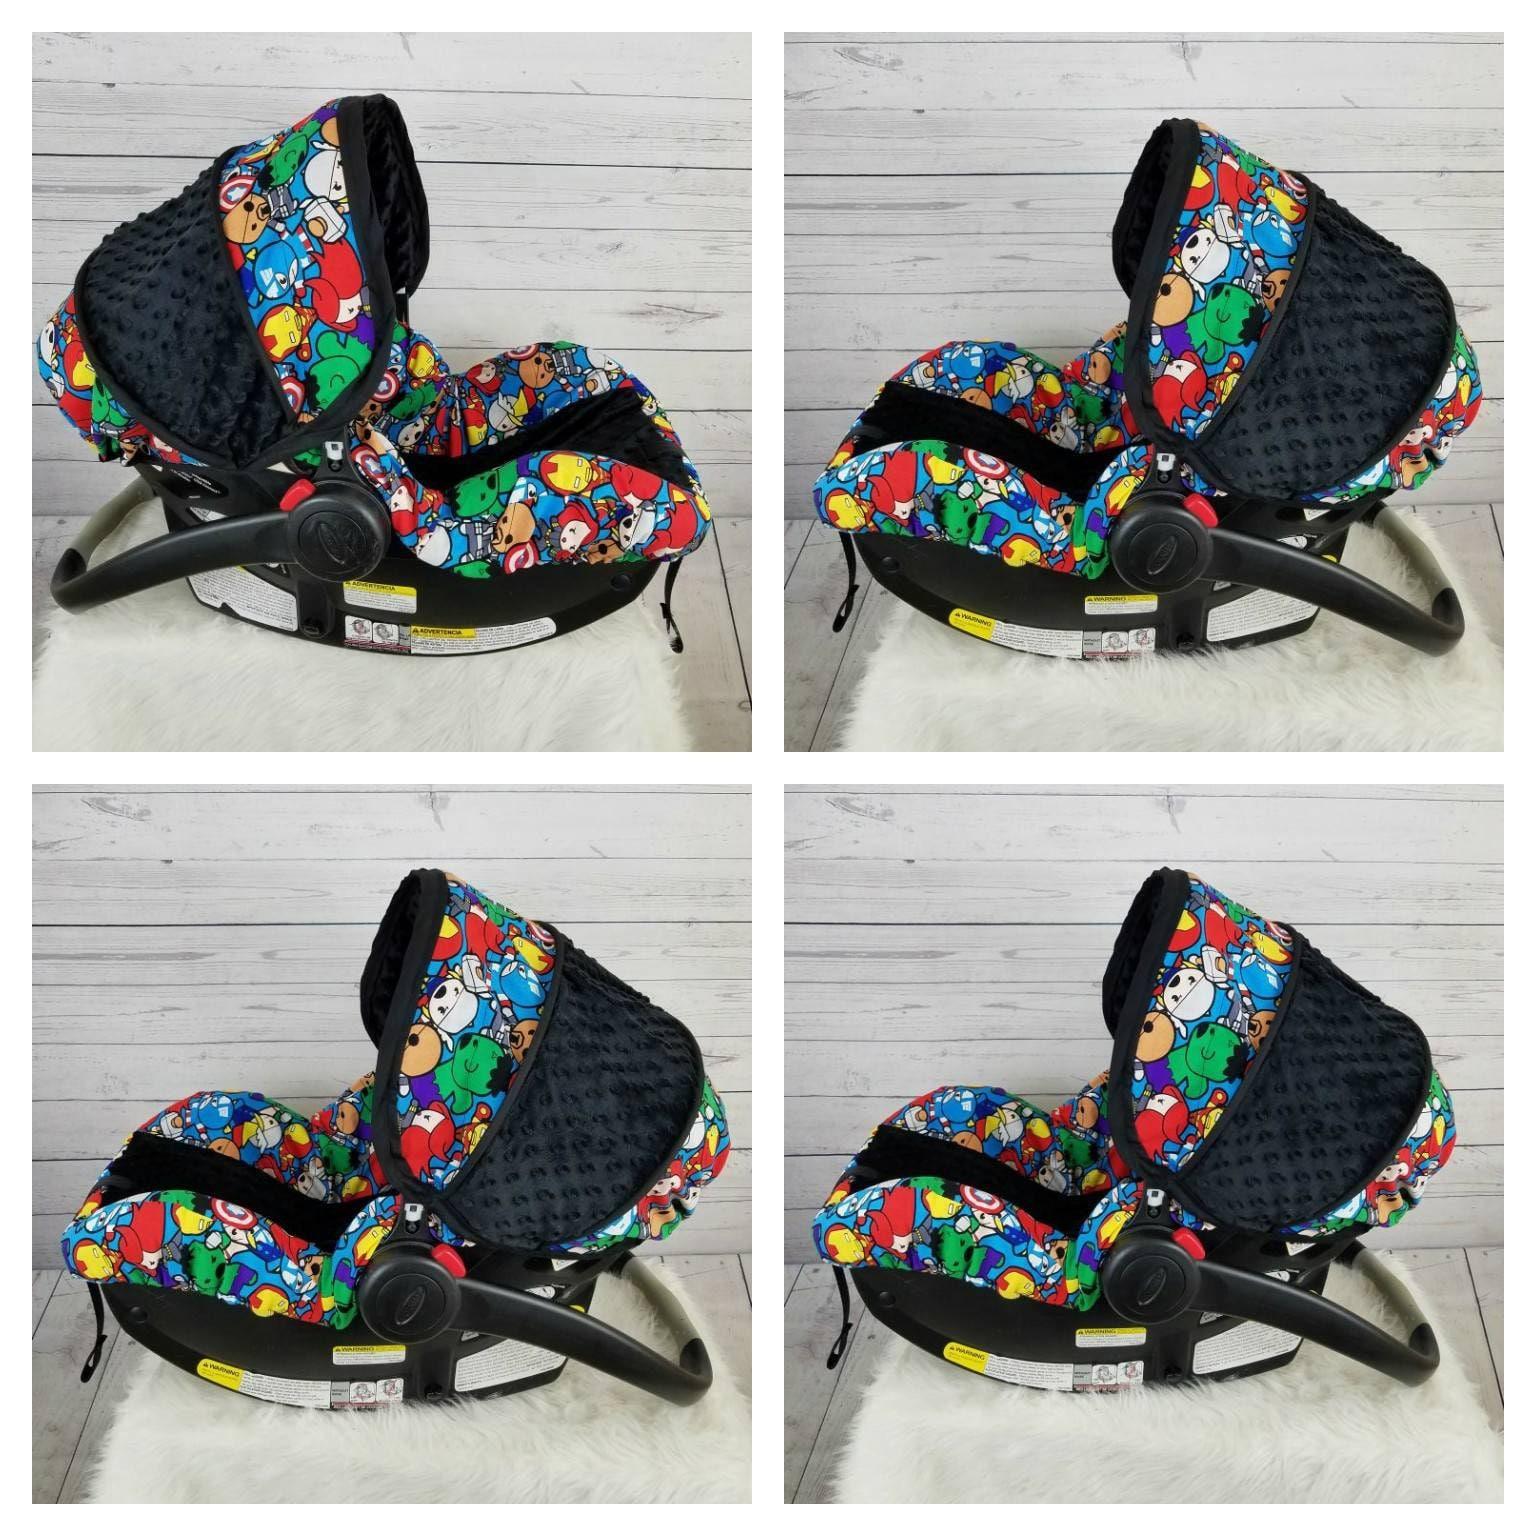 baby avengers super hero infant car seat cover with black etsy. Black Bedroom Furniture Sets. Home Design Ideas